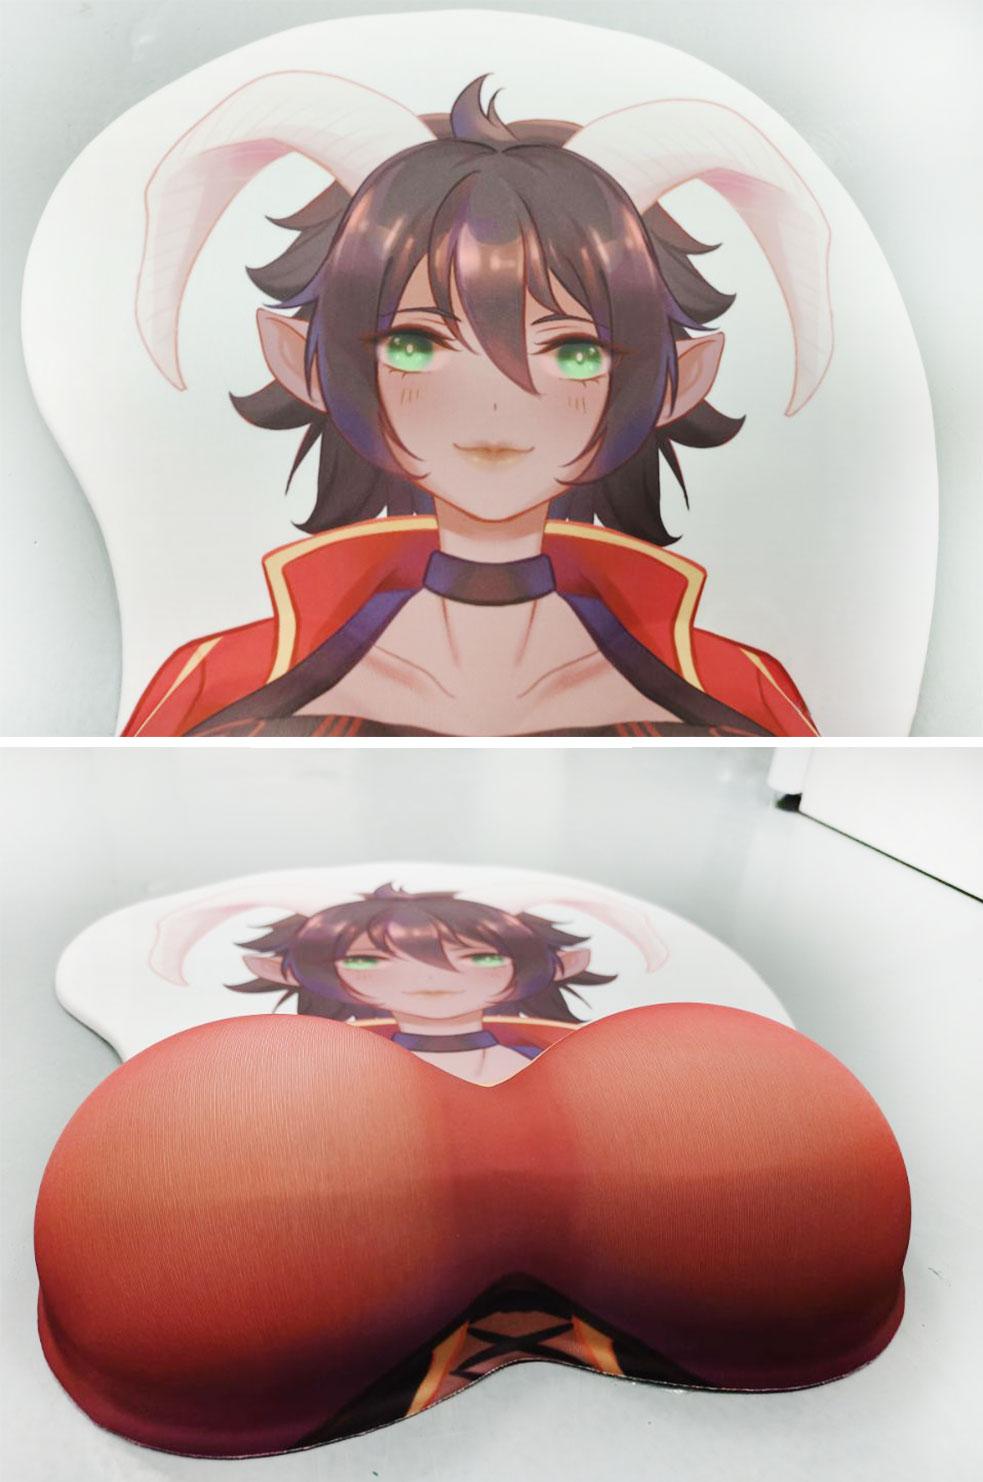 yumemi riamu life size oppai mousepad 6661 - Anime Mousepads